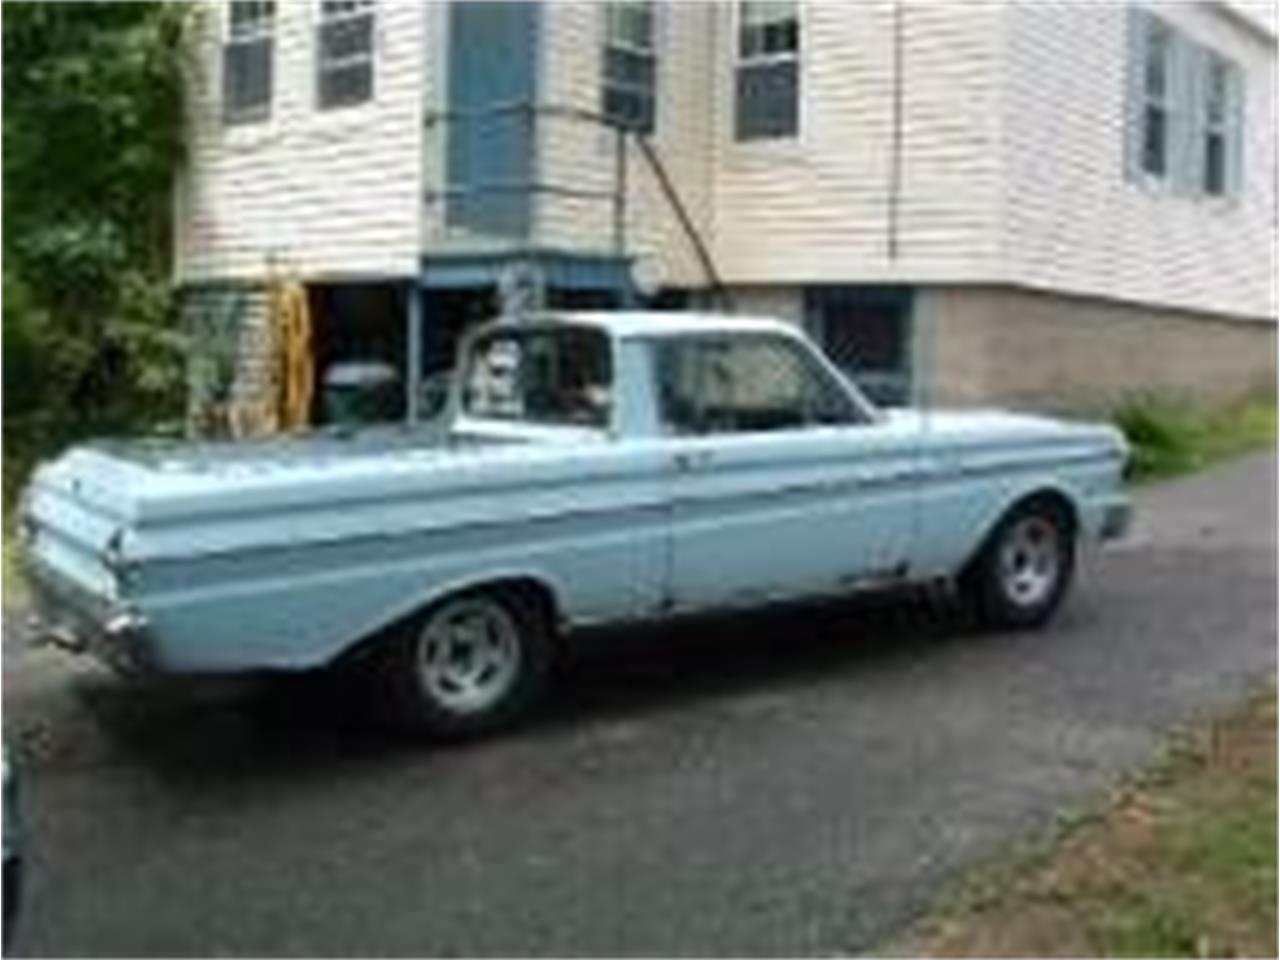 For Sale: 1965 Ford Ranchero in Cadillac, Michigan